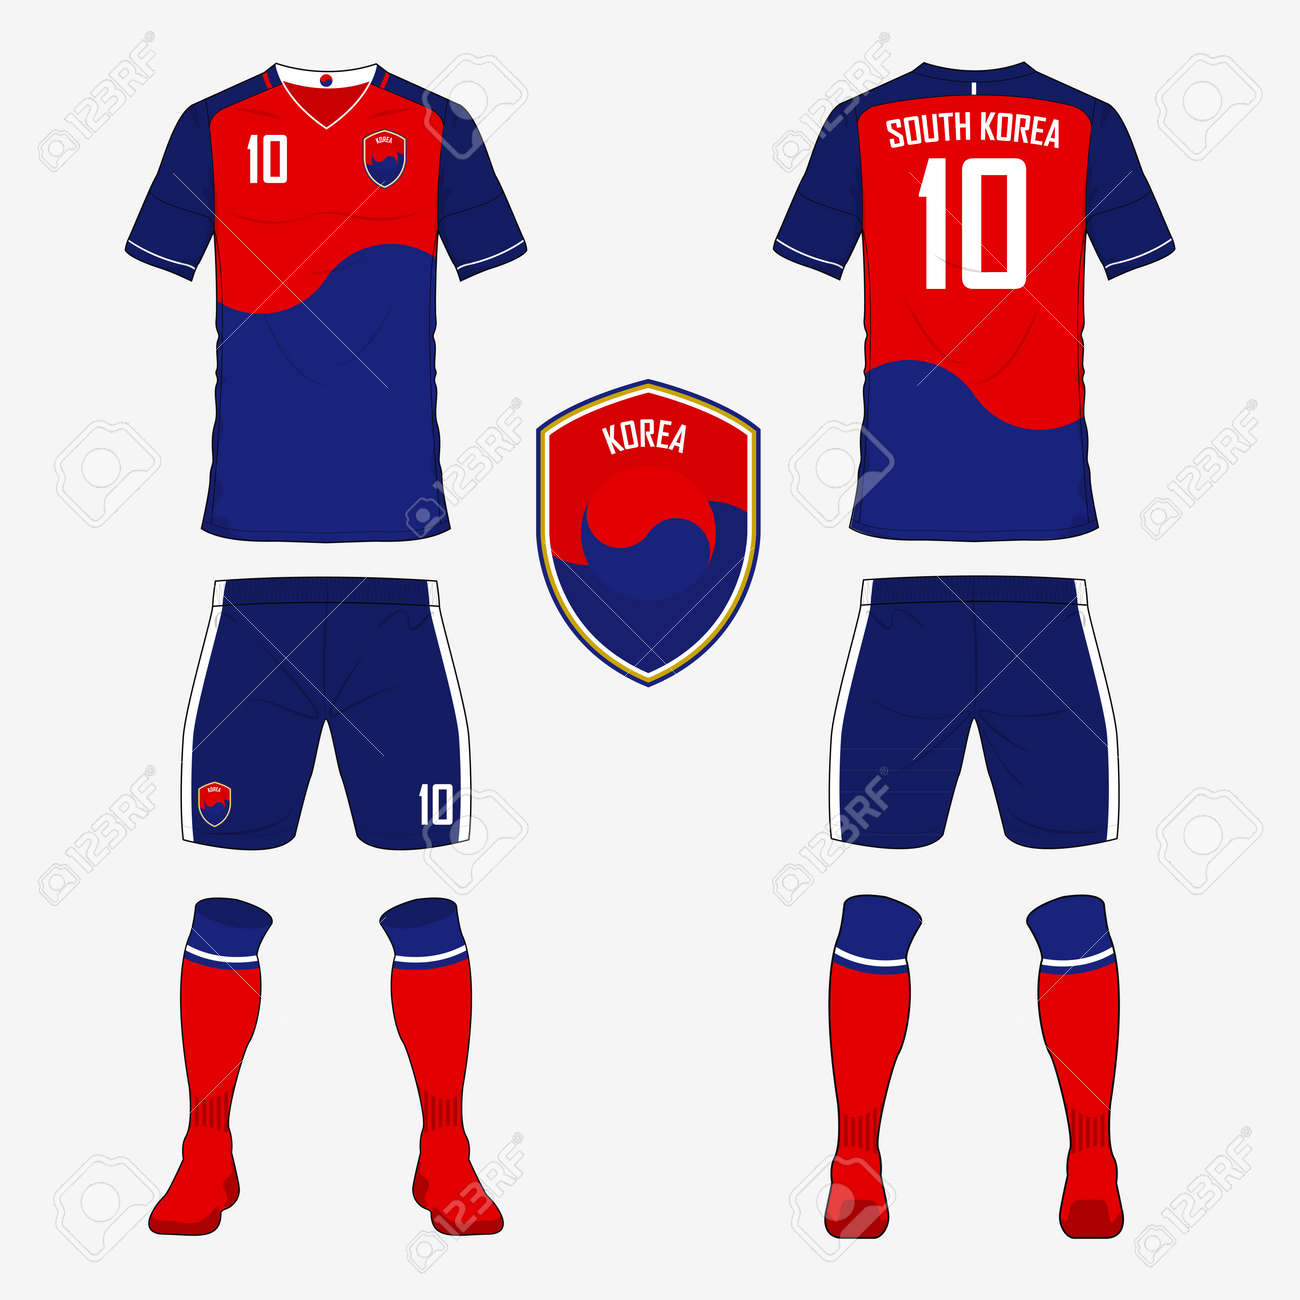 e64953d30 Vector Illustration. Set of soccer jersey or football kit template for South  Korea national football team. Front